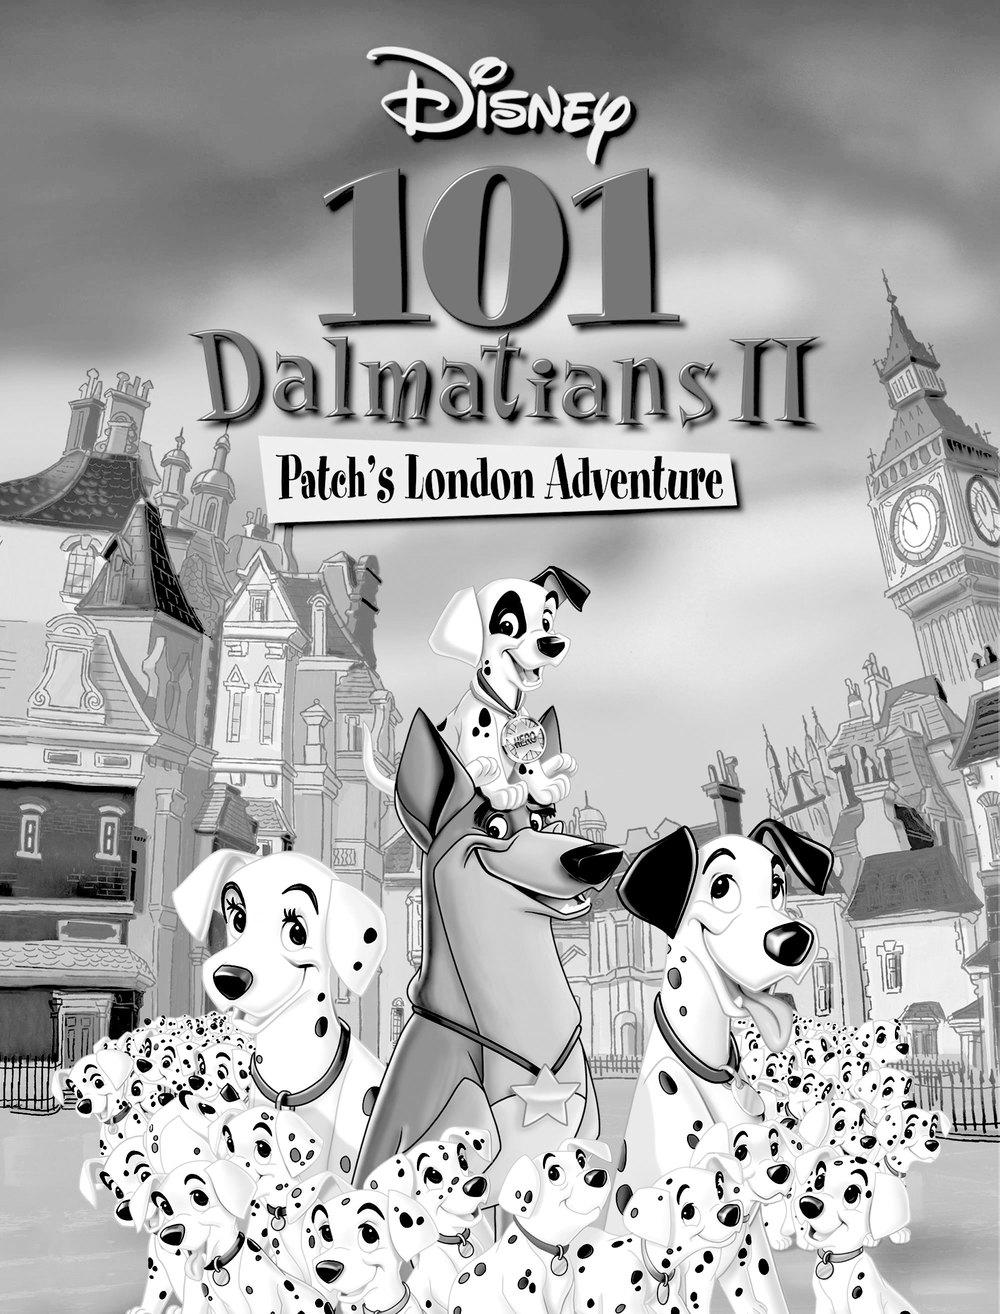 101-dalmations-II-2-disney-patch's-london-adventure-film-score-composer-richard-gibbs.jpg